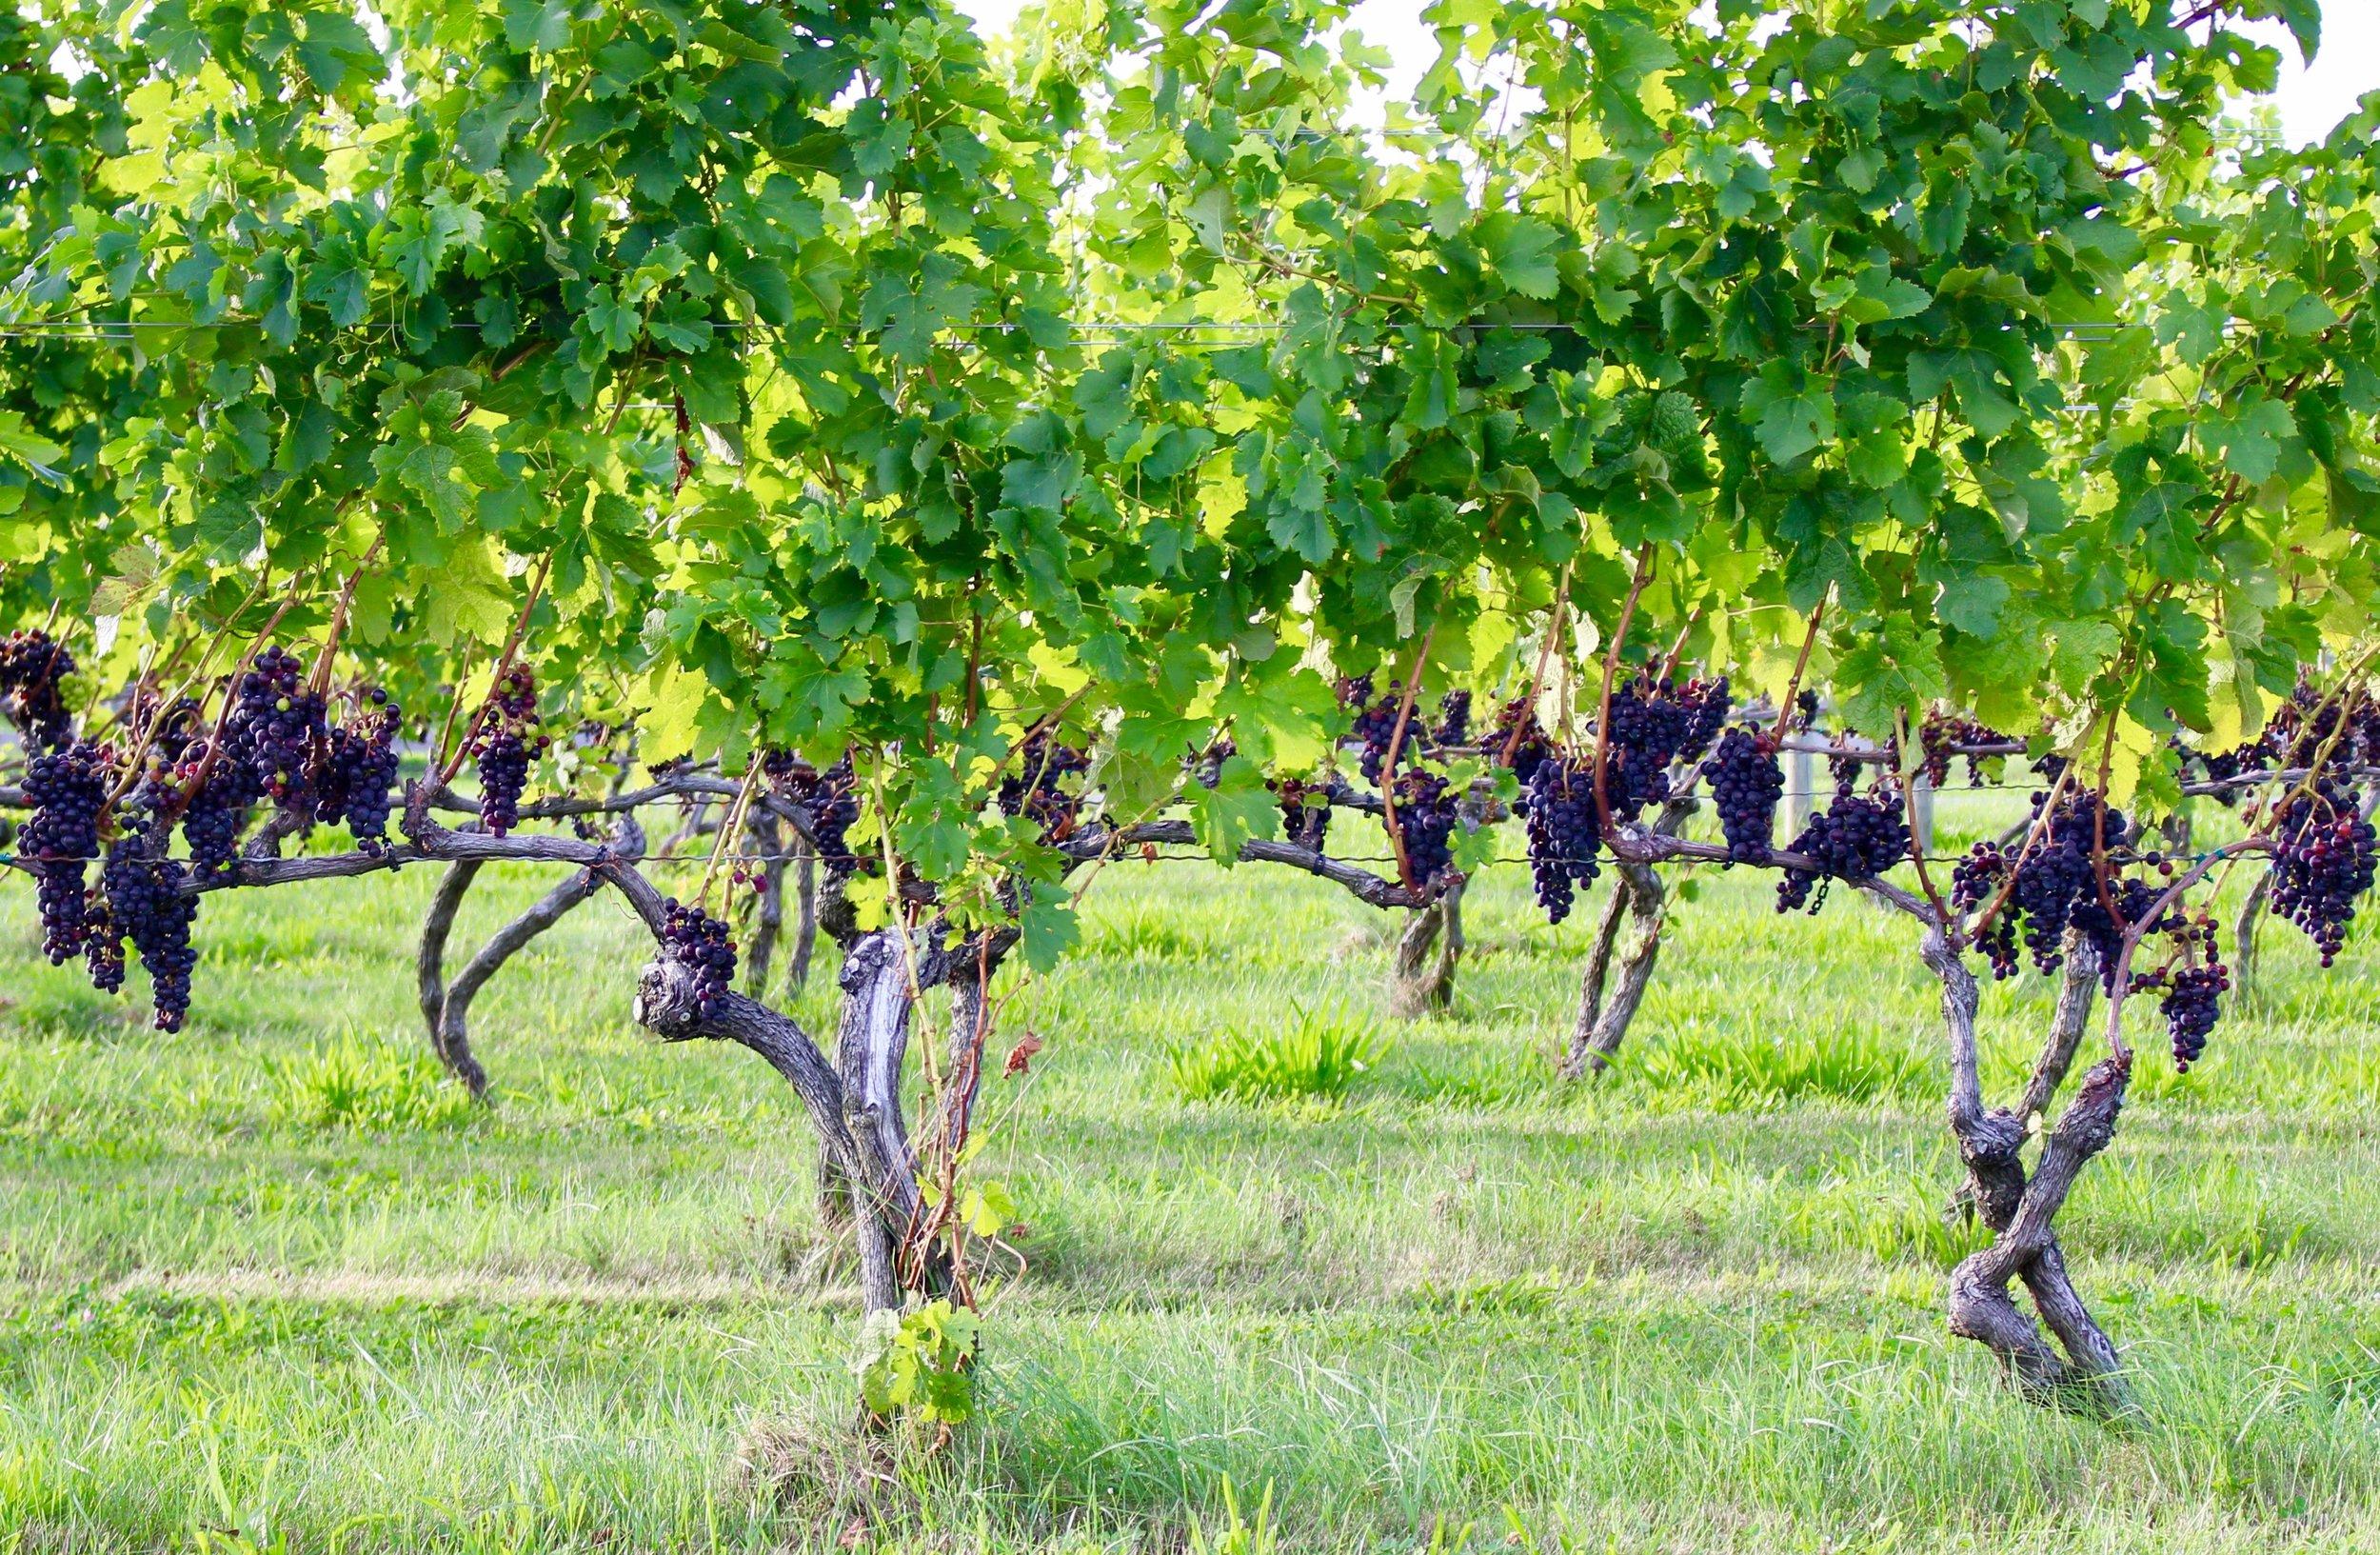 Reds Ripening on Vines